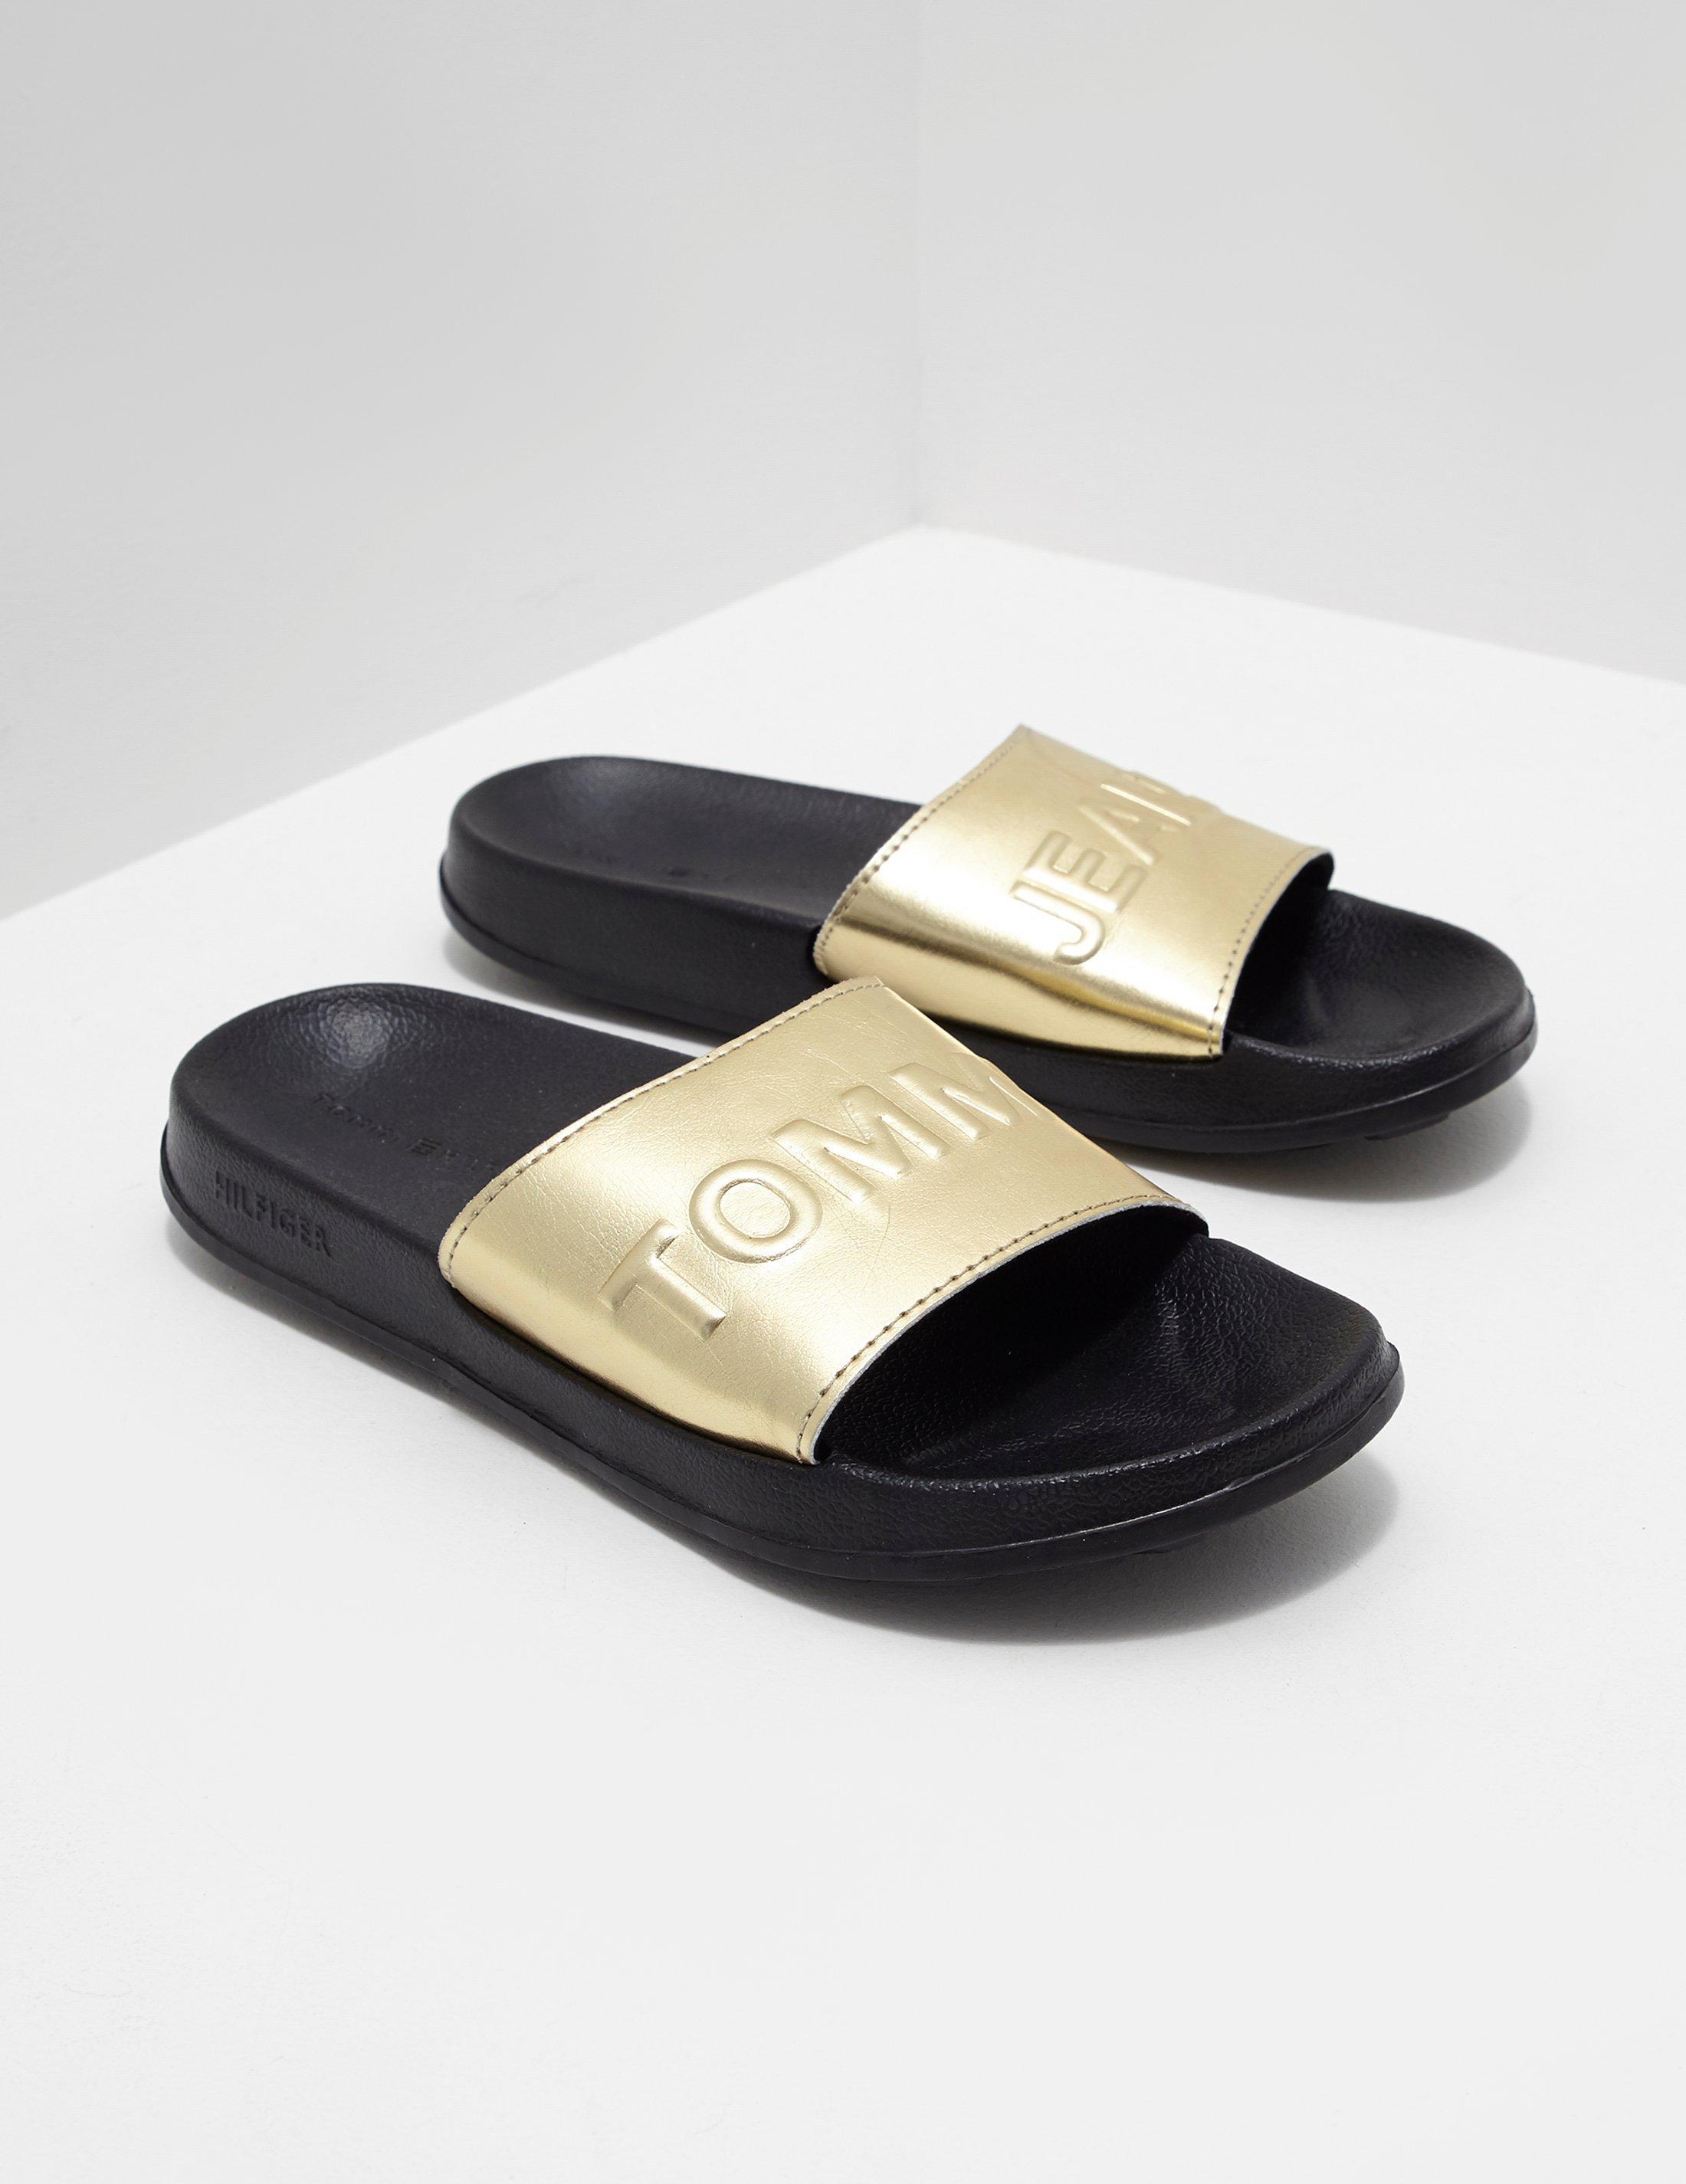 3af175d77 Lyst - Tommy Hilfiger Womens Metallic Pool Slides Gold in Metallic